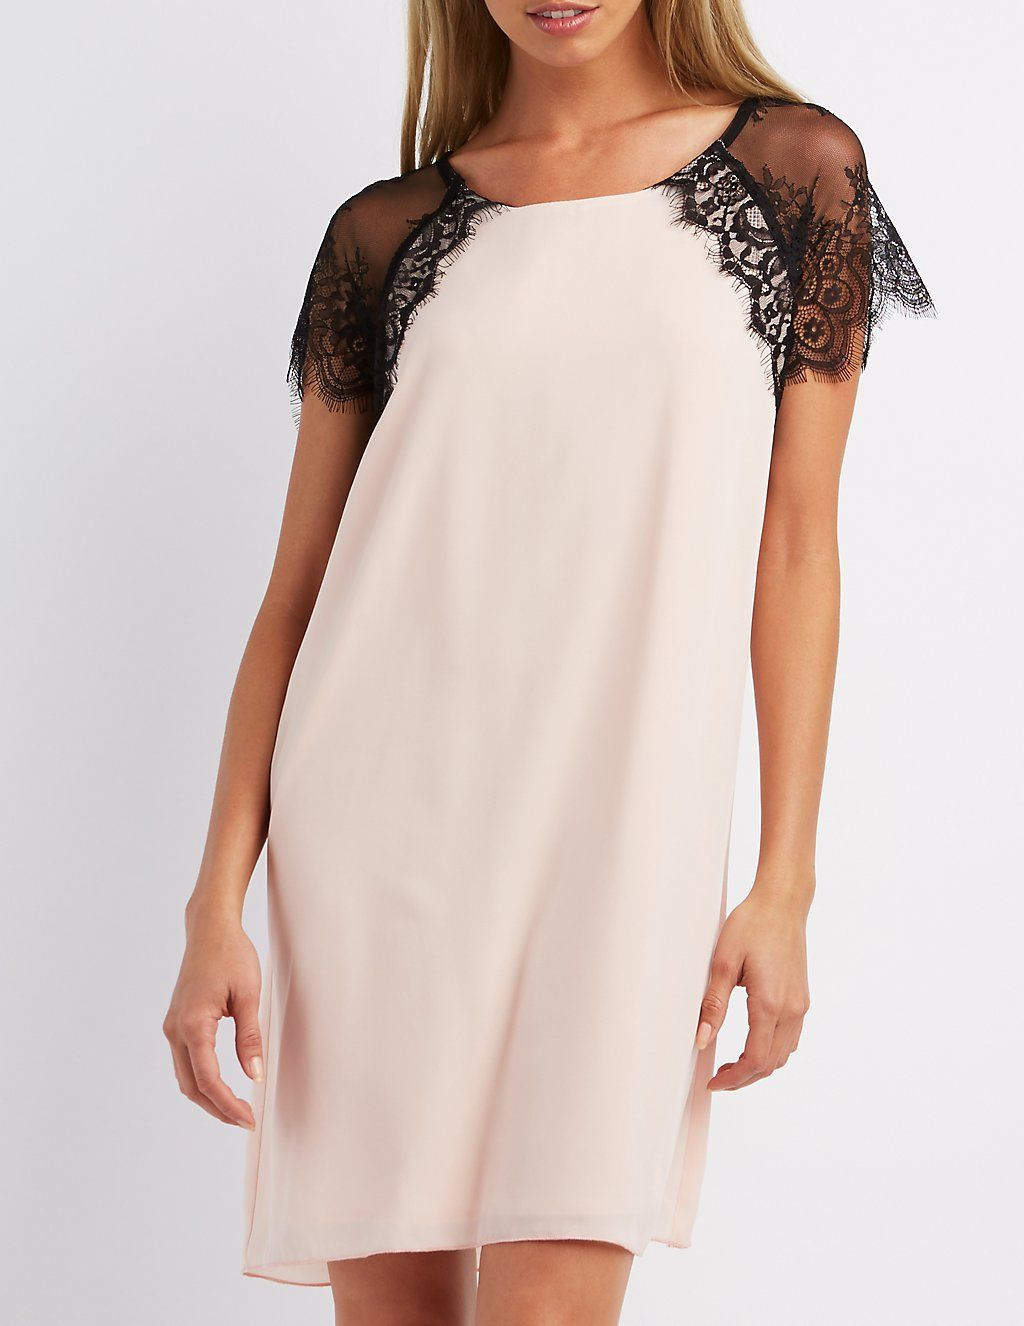 Lace Sleeve Shift Dress | Charlotte Russe | Homecoming Dress Ideas ...